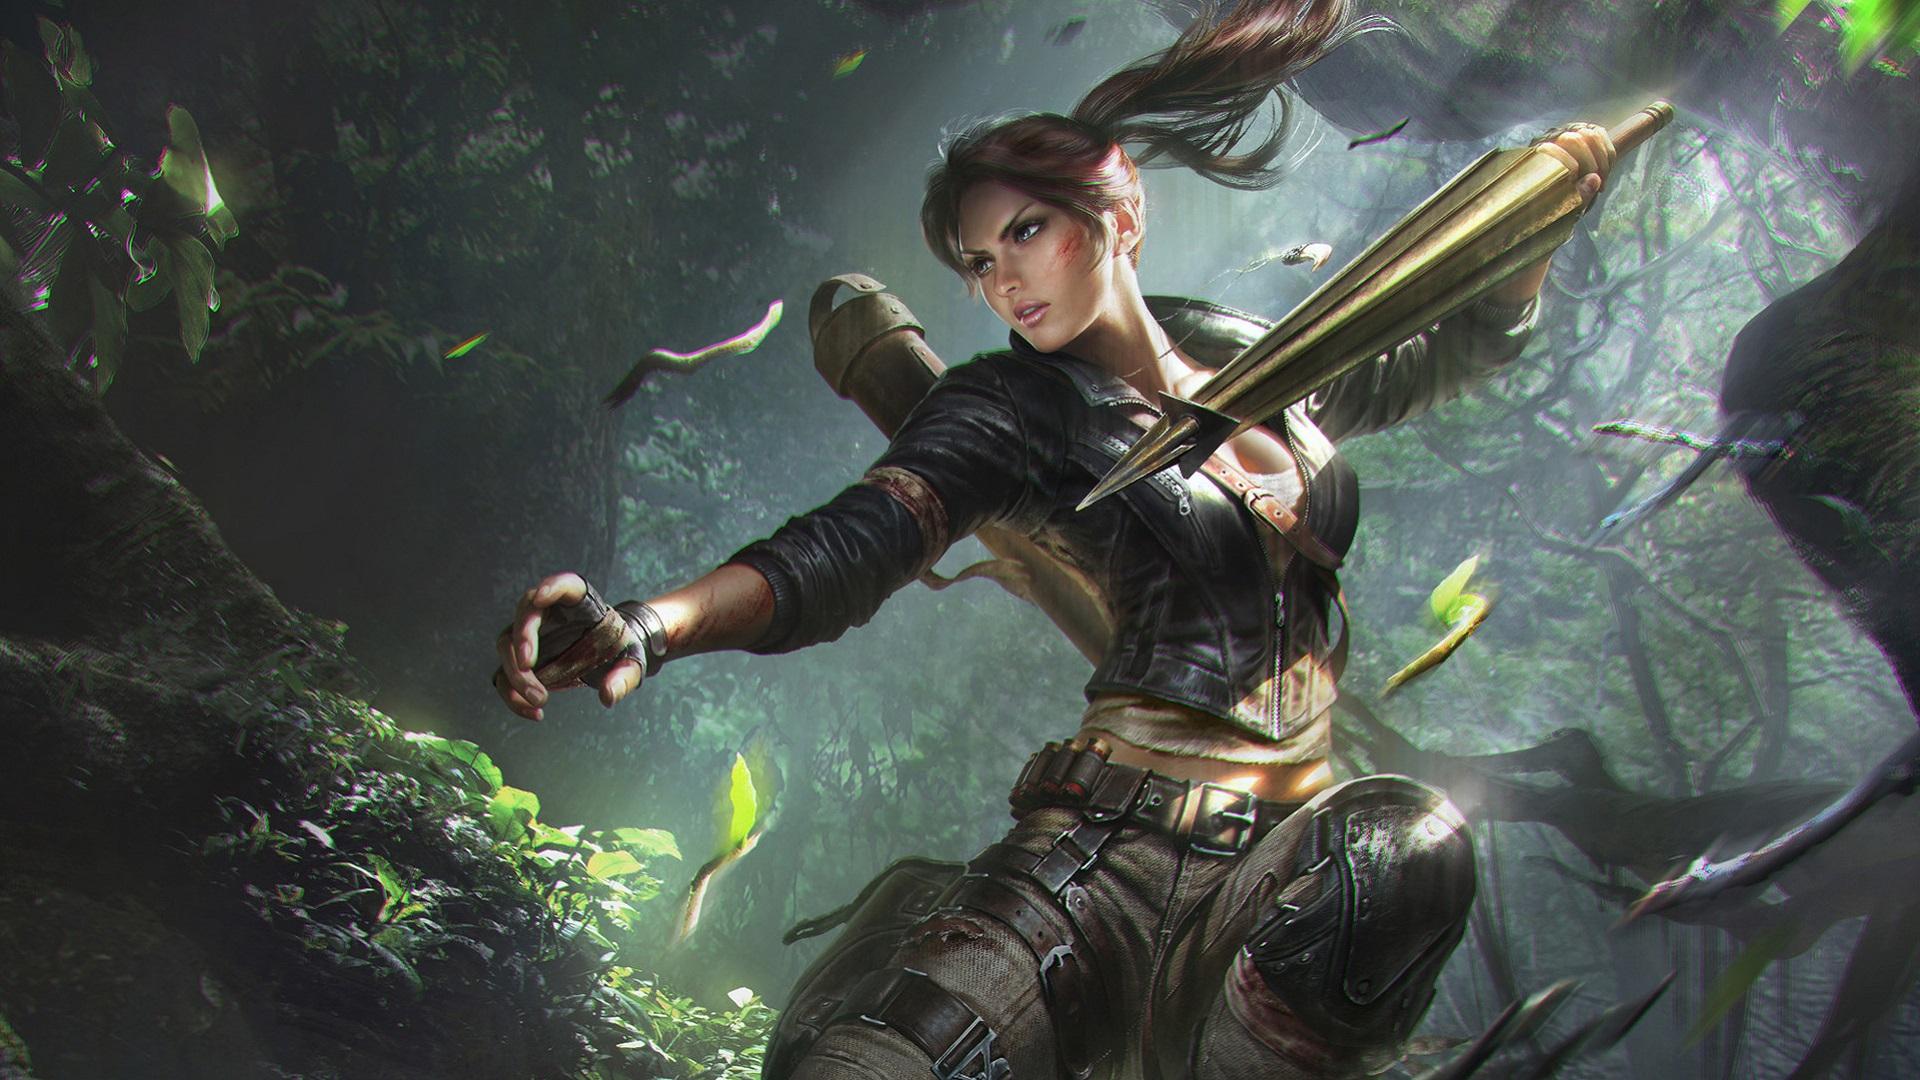 General 1920x1080 digital art women Lara Croft Tomb Raider ponytail video games